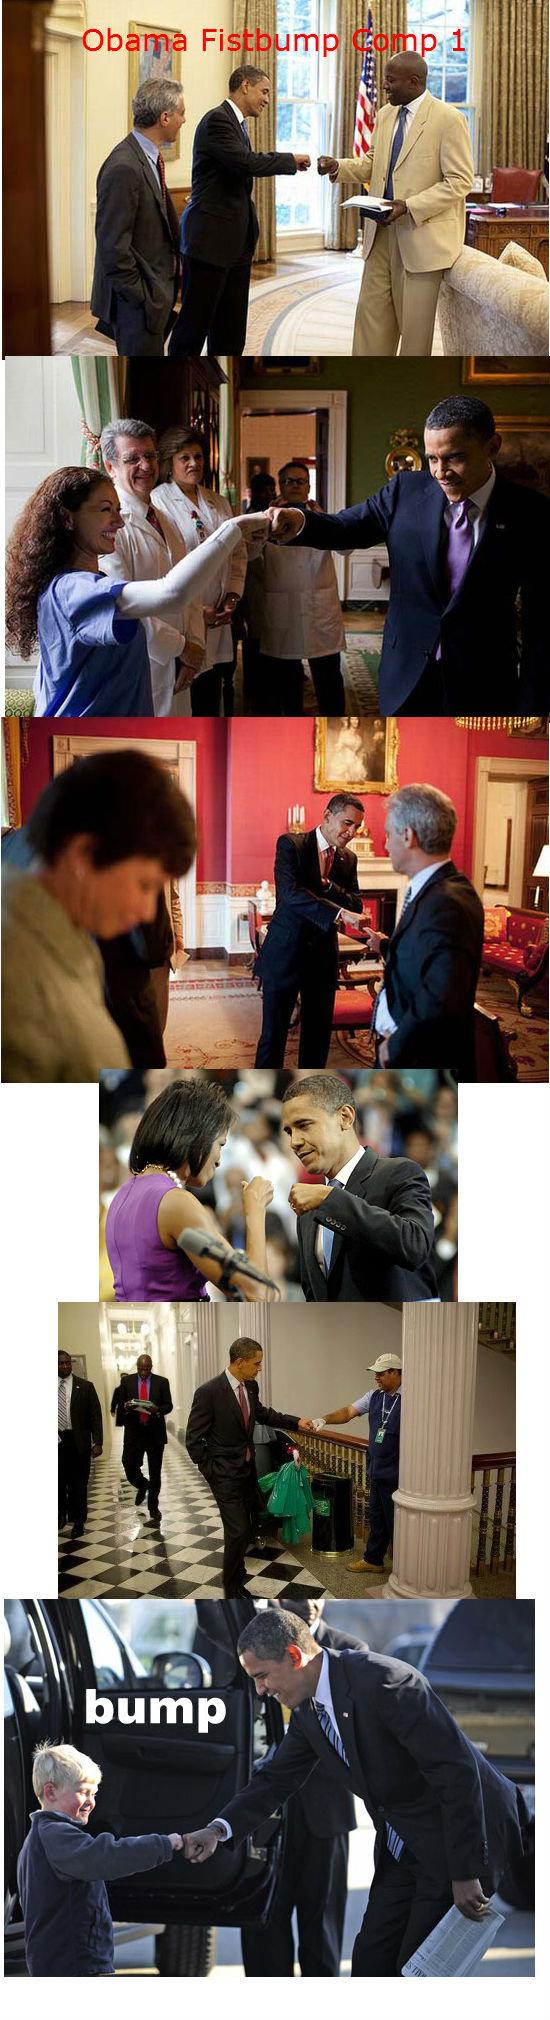 President Obama Fistbump Compilation 1. Like for Obama Fistbump Compilation 2!!.